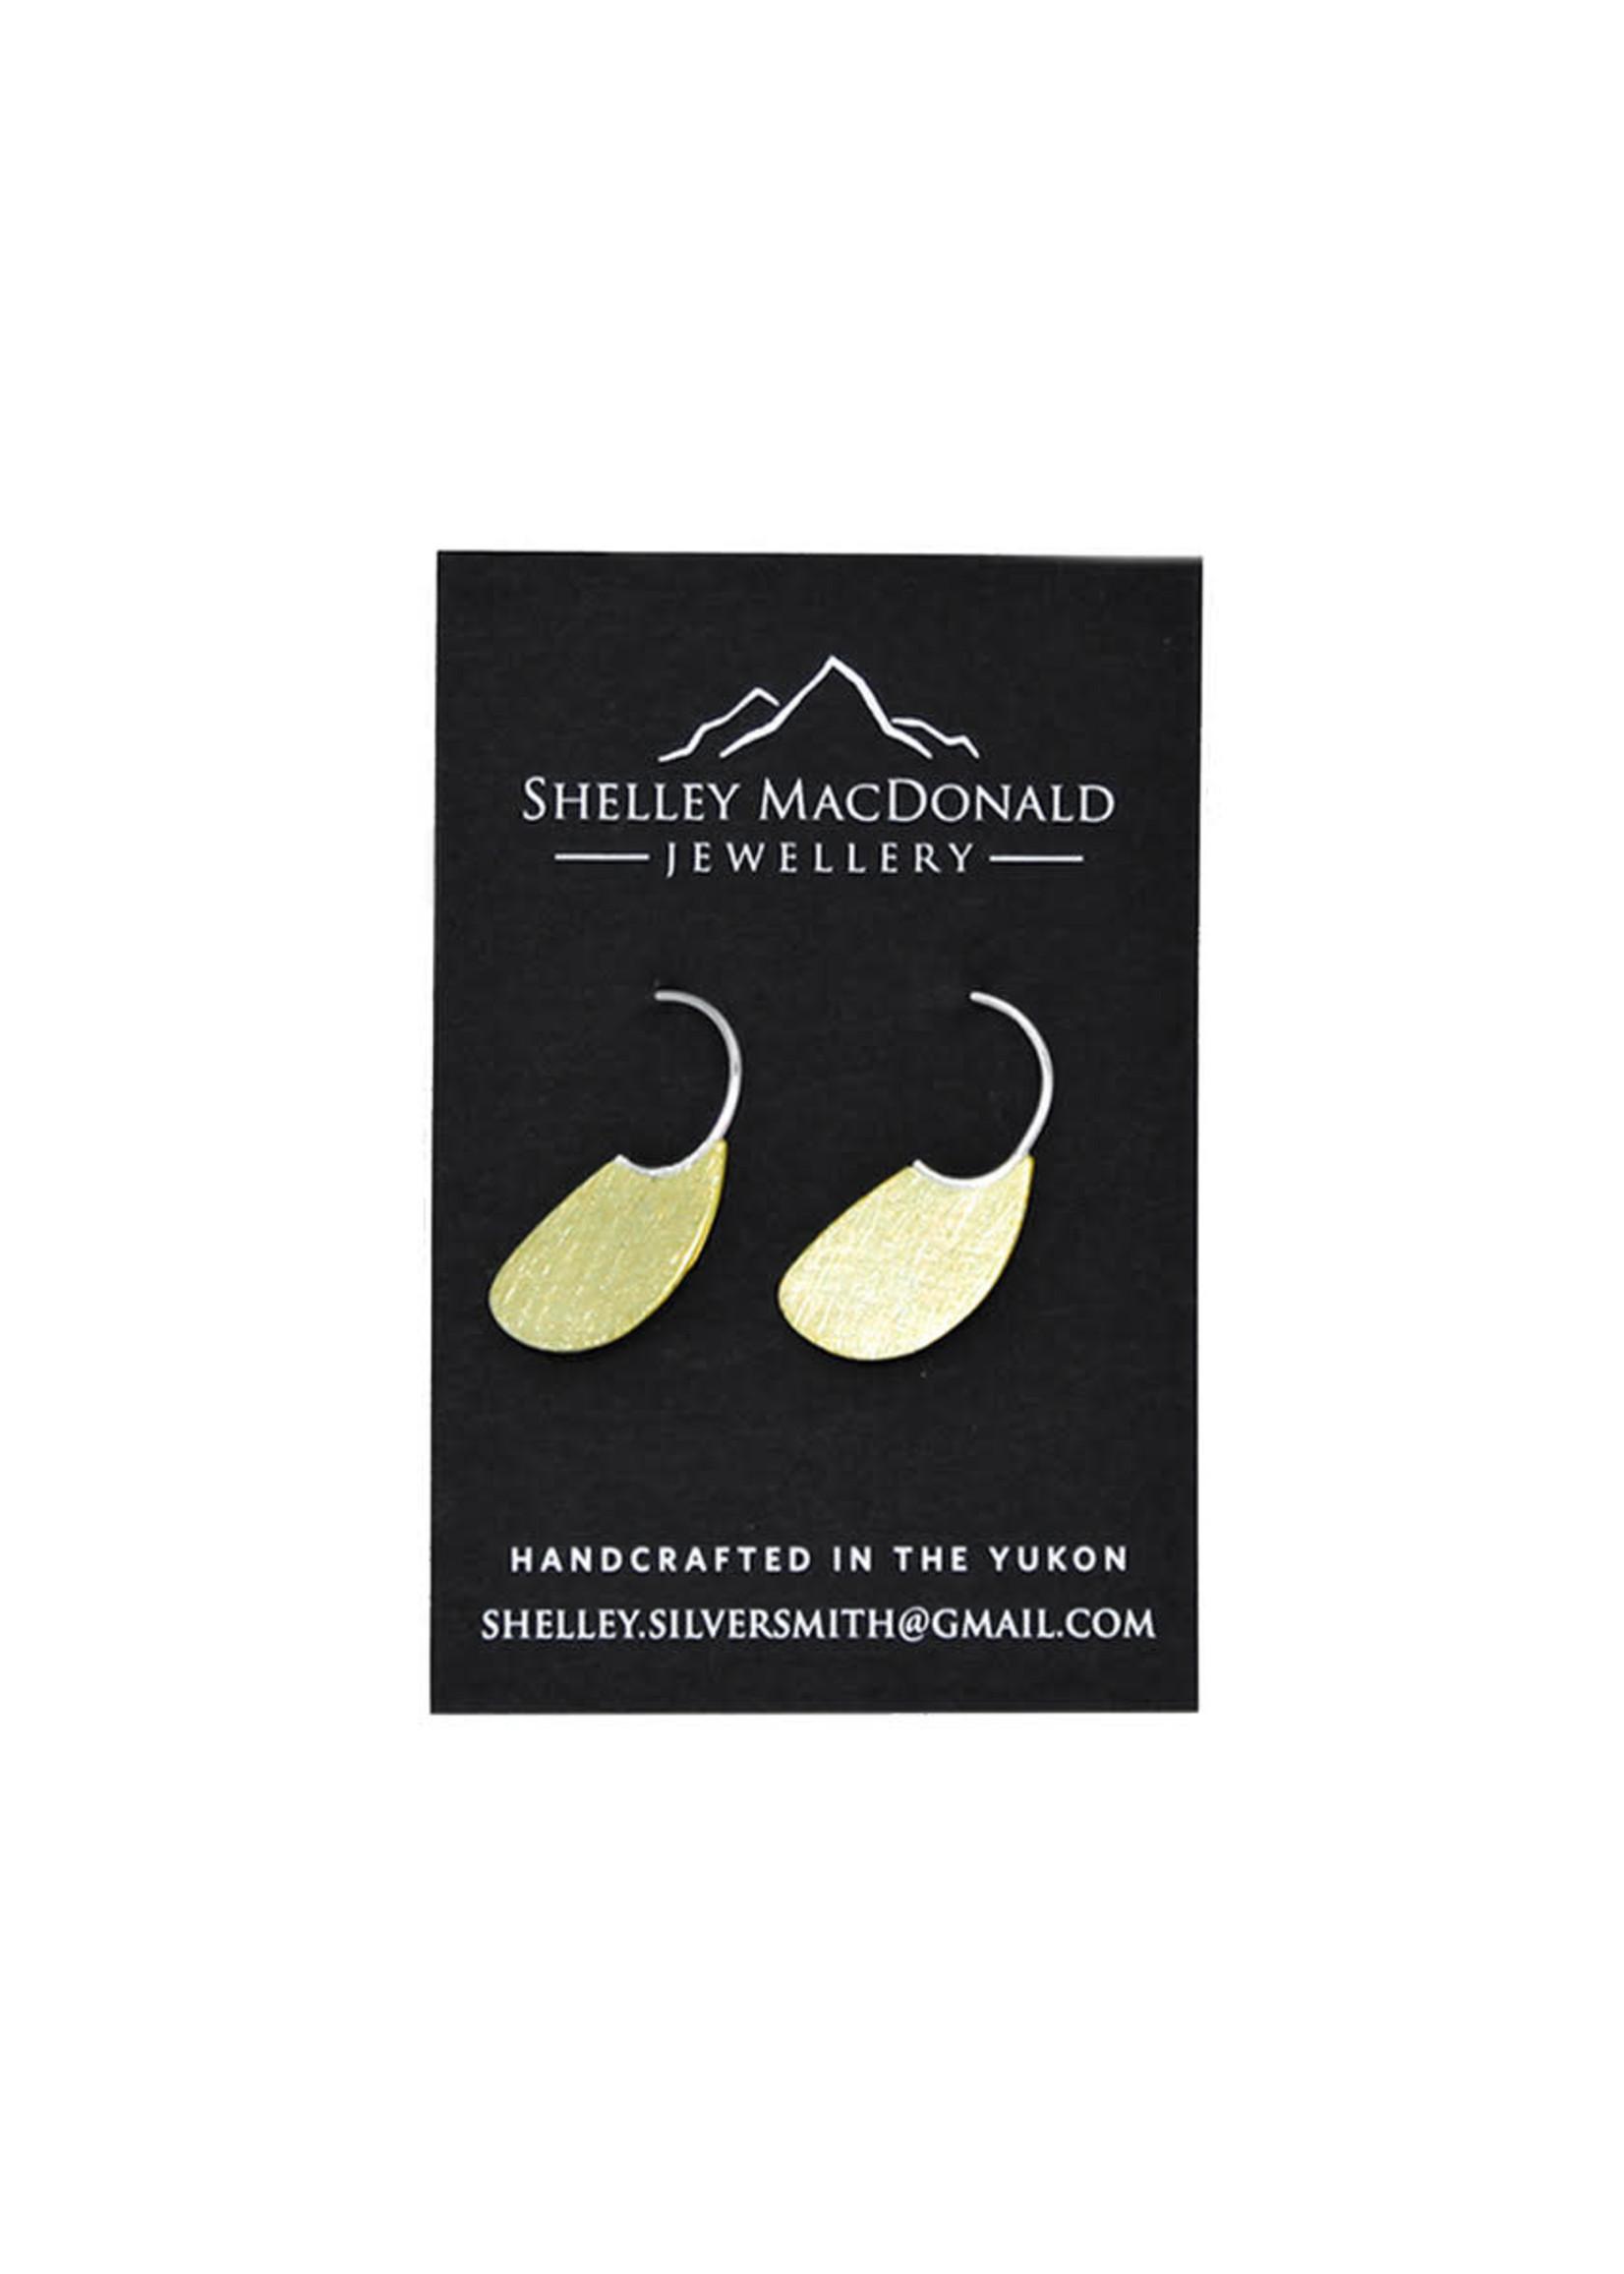 SHELLEY MACDONALD MODERN ULU EARRINGS